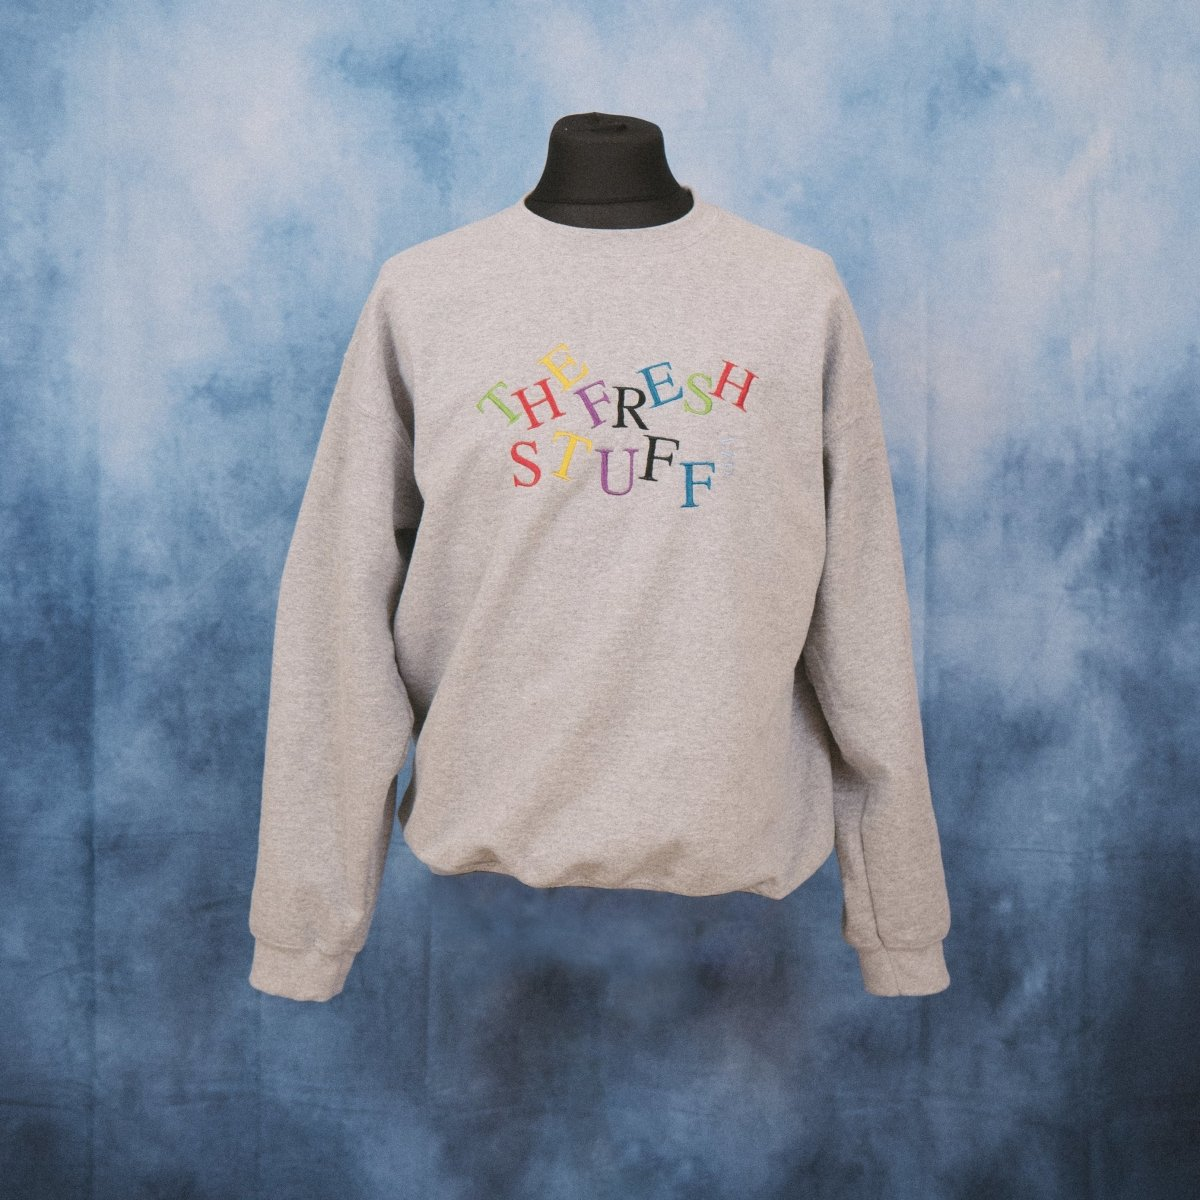 'The Fresh Stuff' Higgledy Unisex Embroidered Sweater